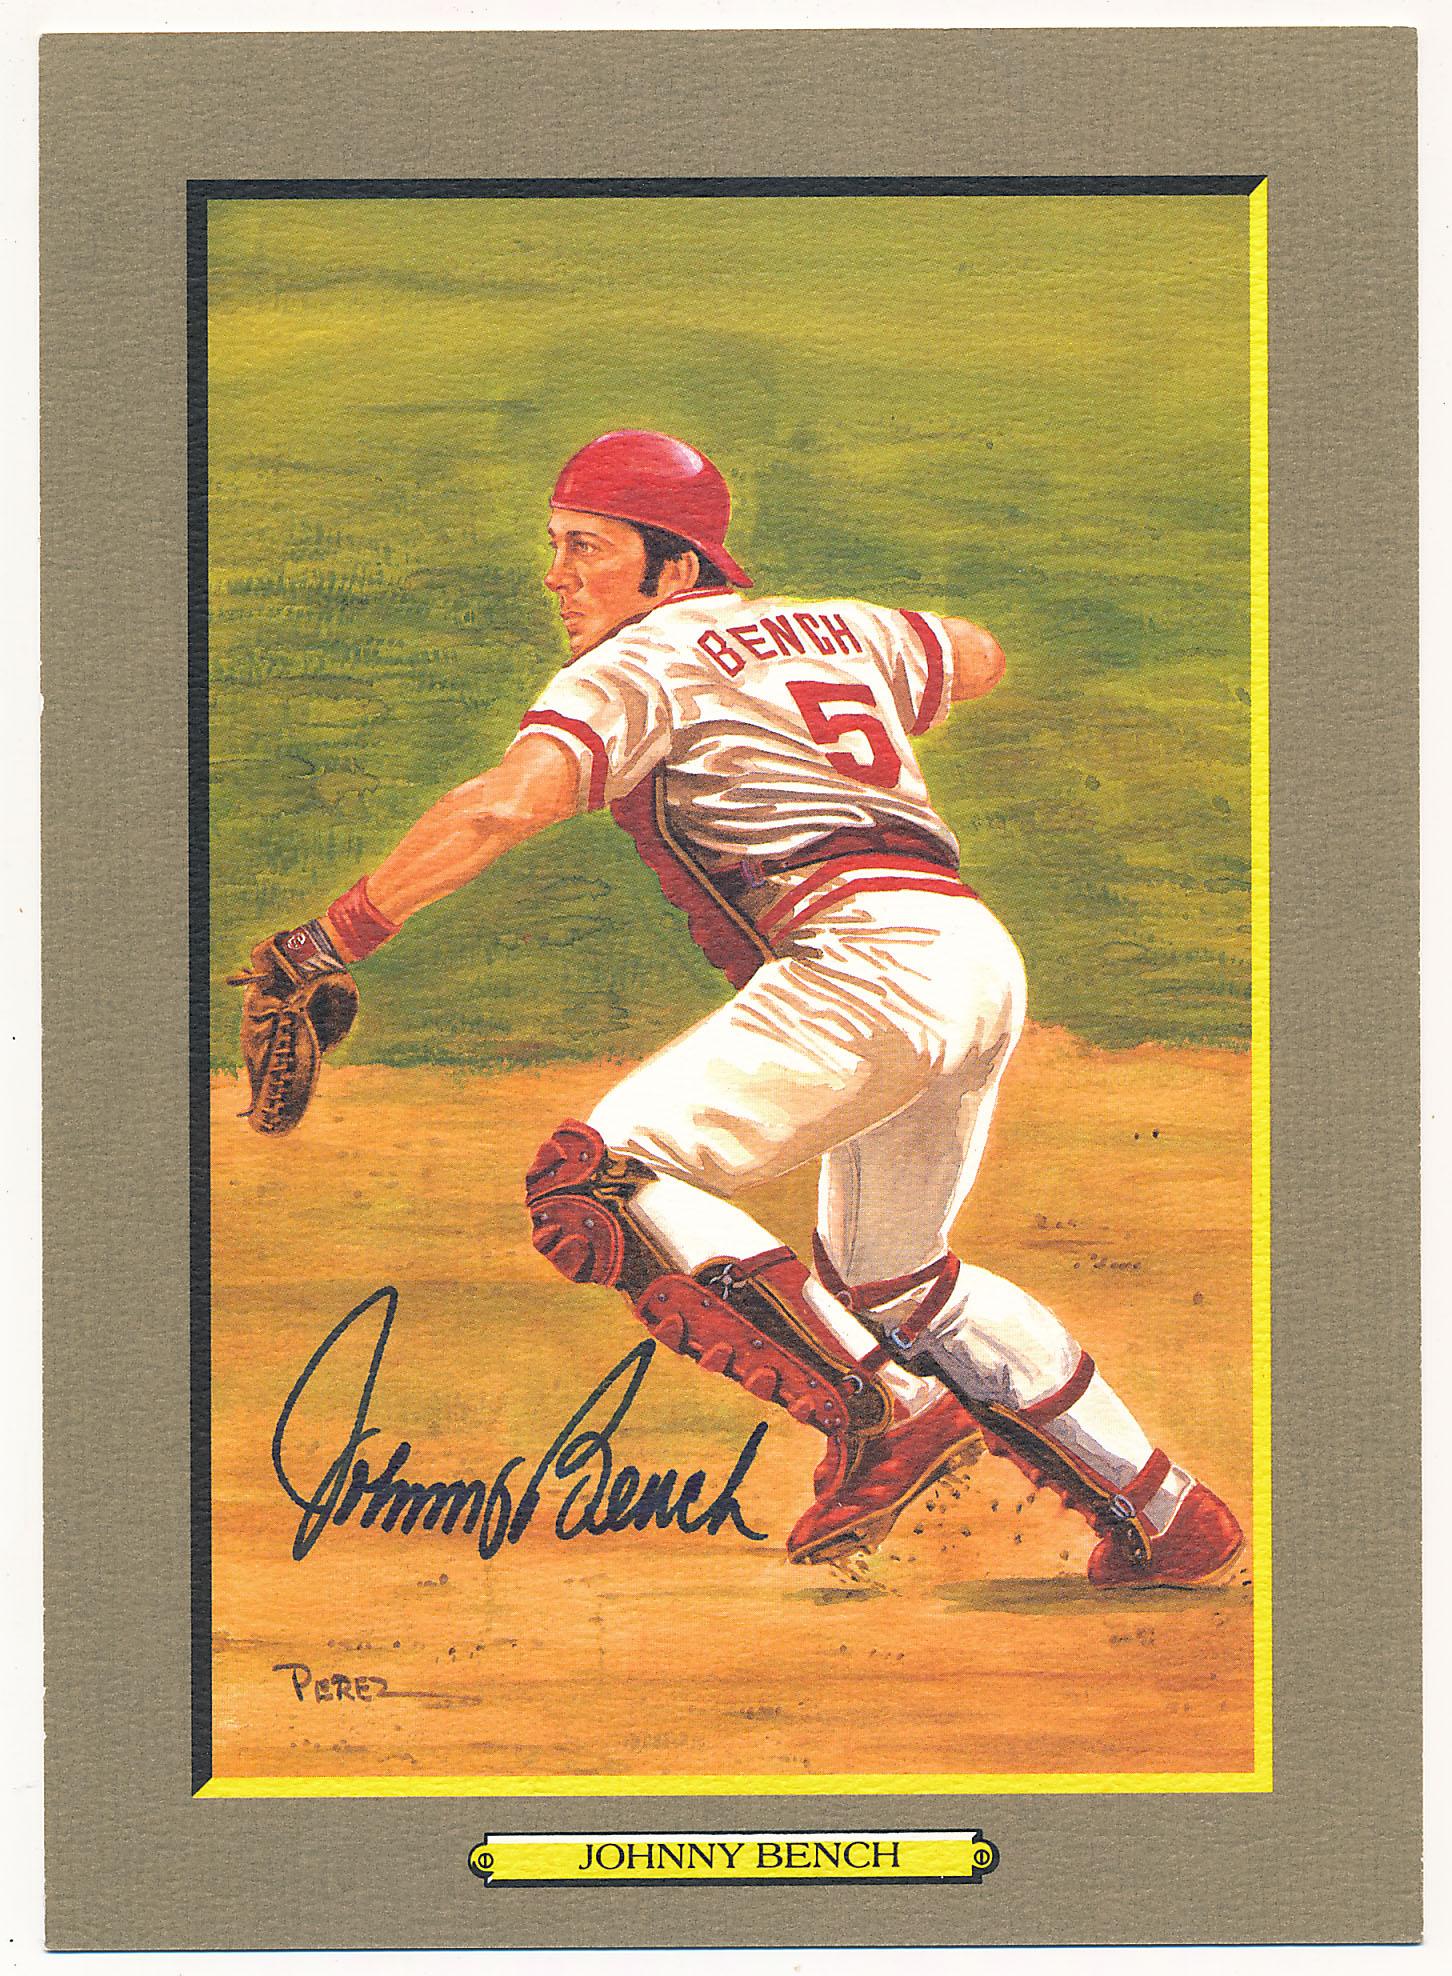 Lot #127 1985 Perez Steele Greatest Moments # 49 Johnny Bench (JSA LOAA) Cond: 9.5